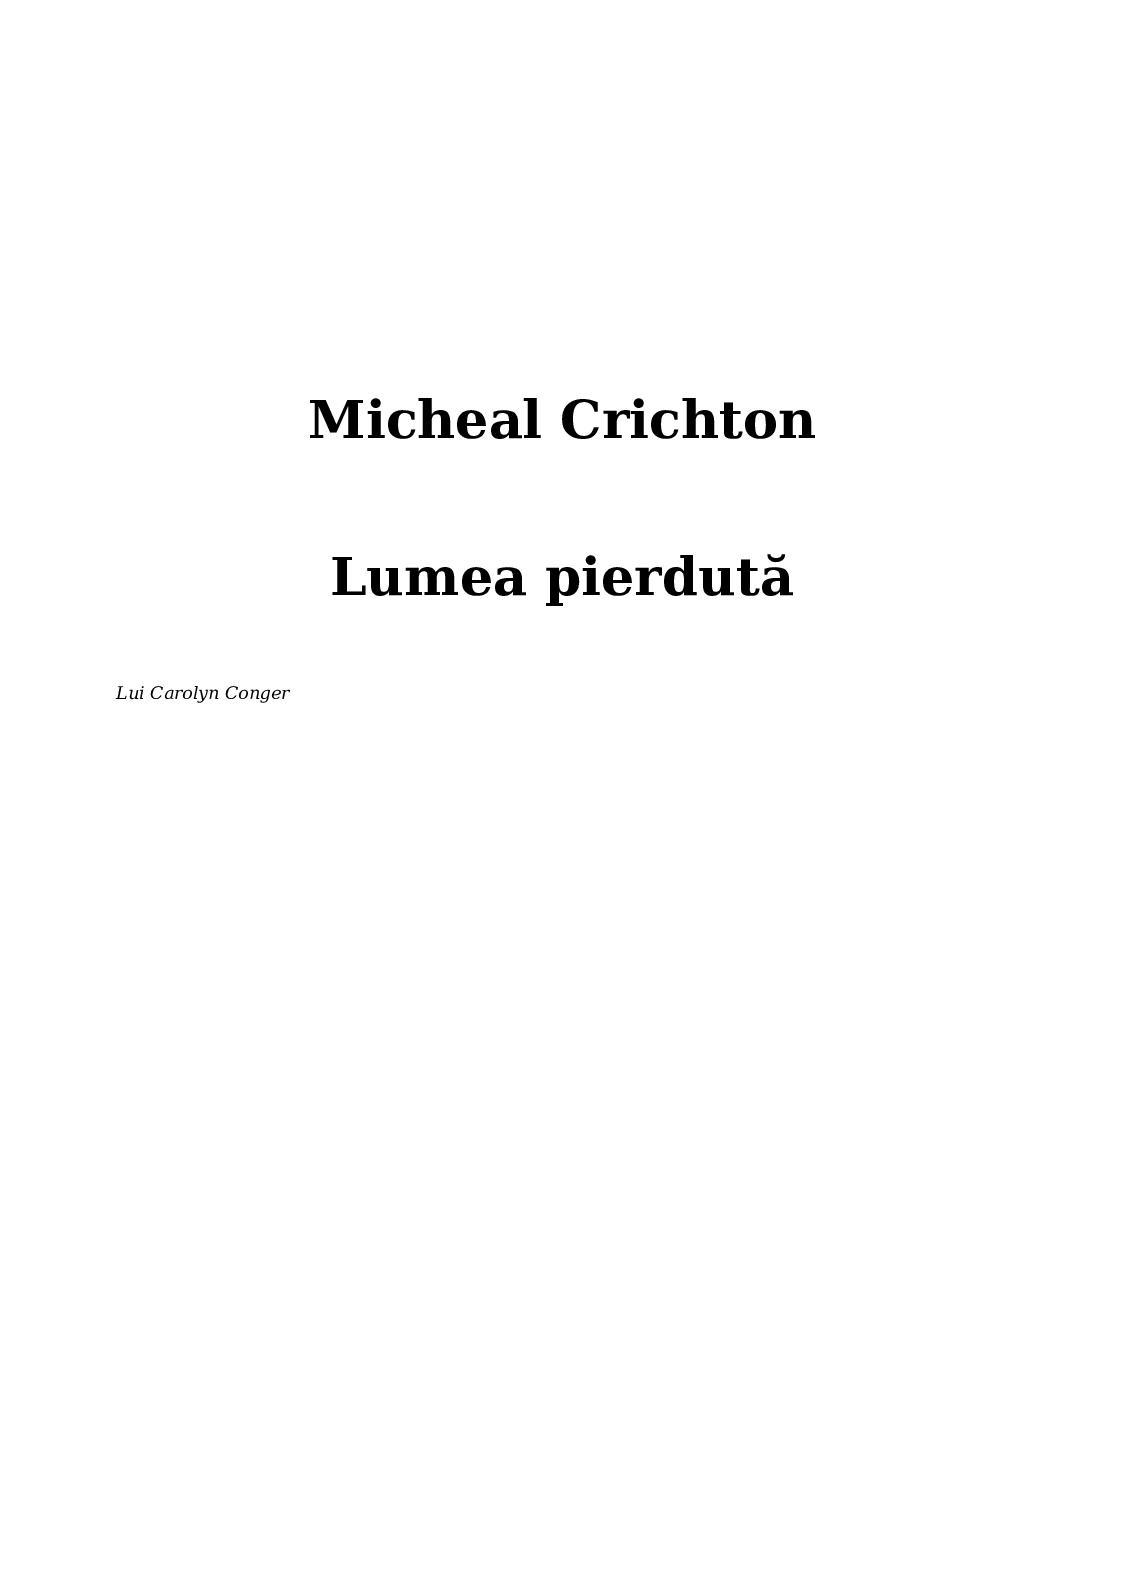 Lumea Pierduta - Micheal Crichton